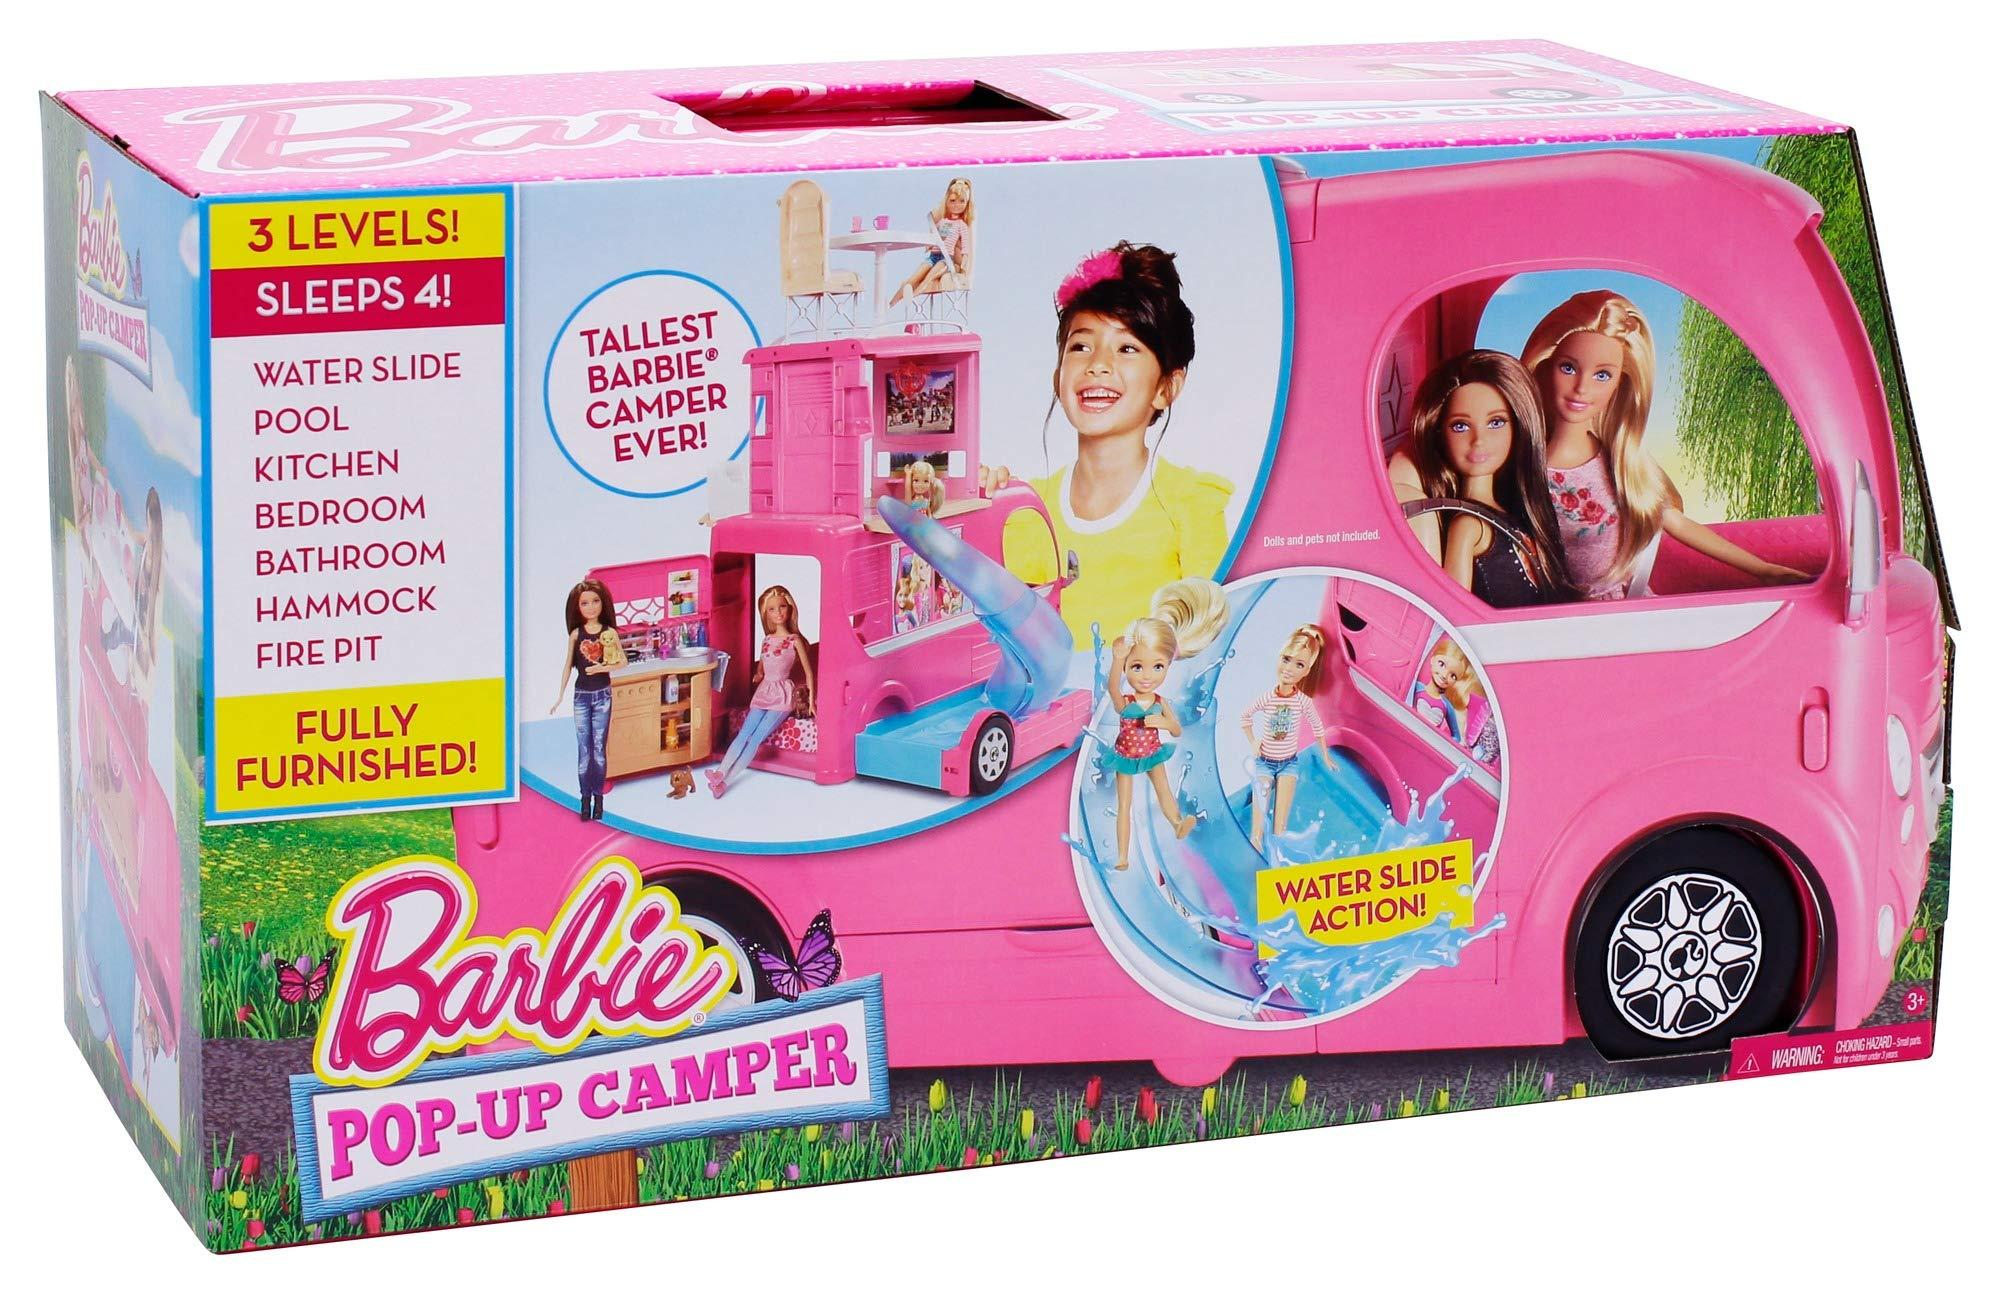 CaravanaAccesorios Barbie Las Cjt42 Para Muñecasmattel 3ulKFT1Jc